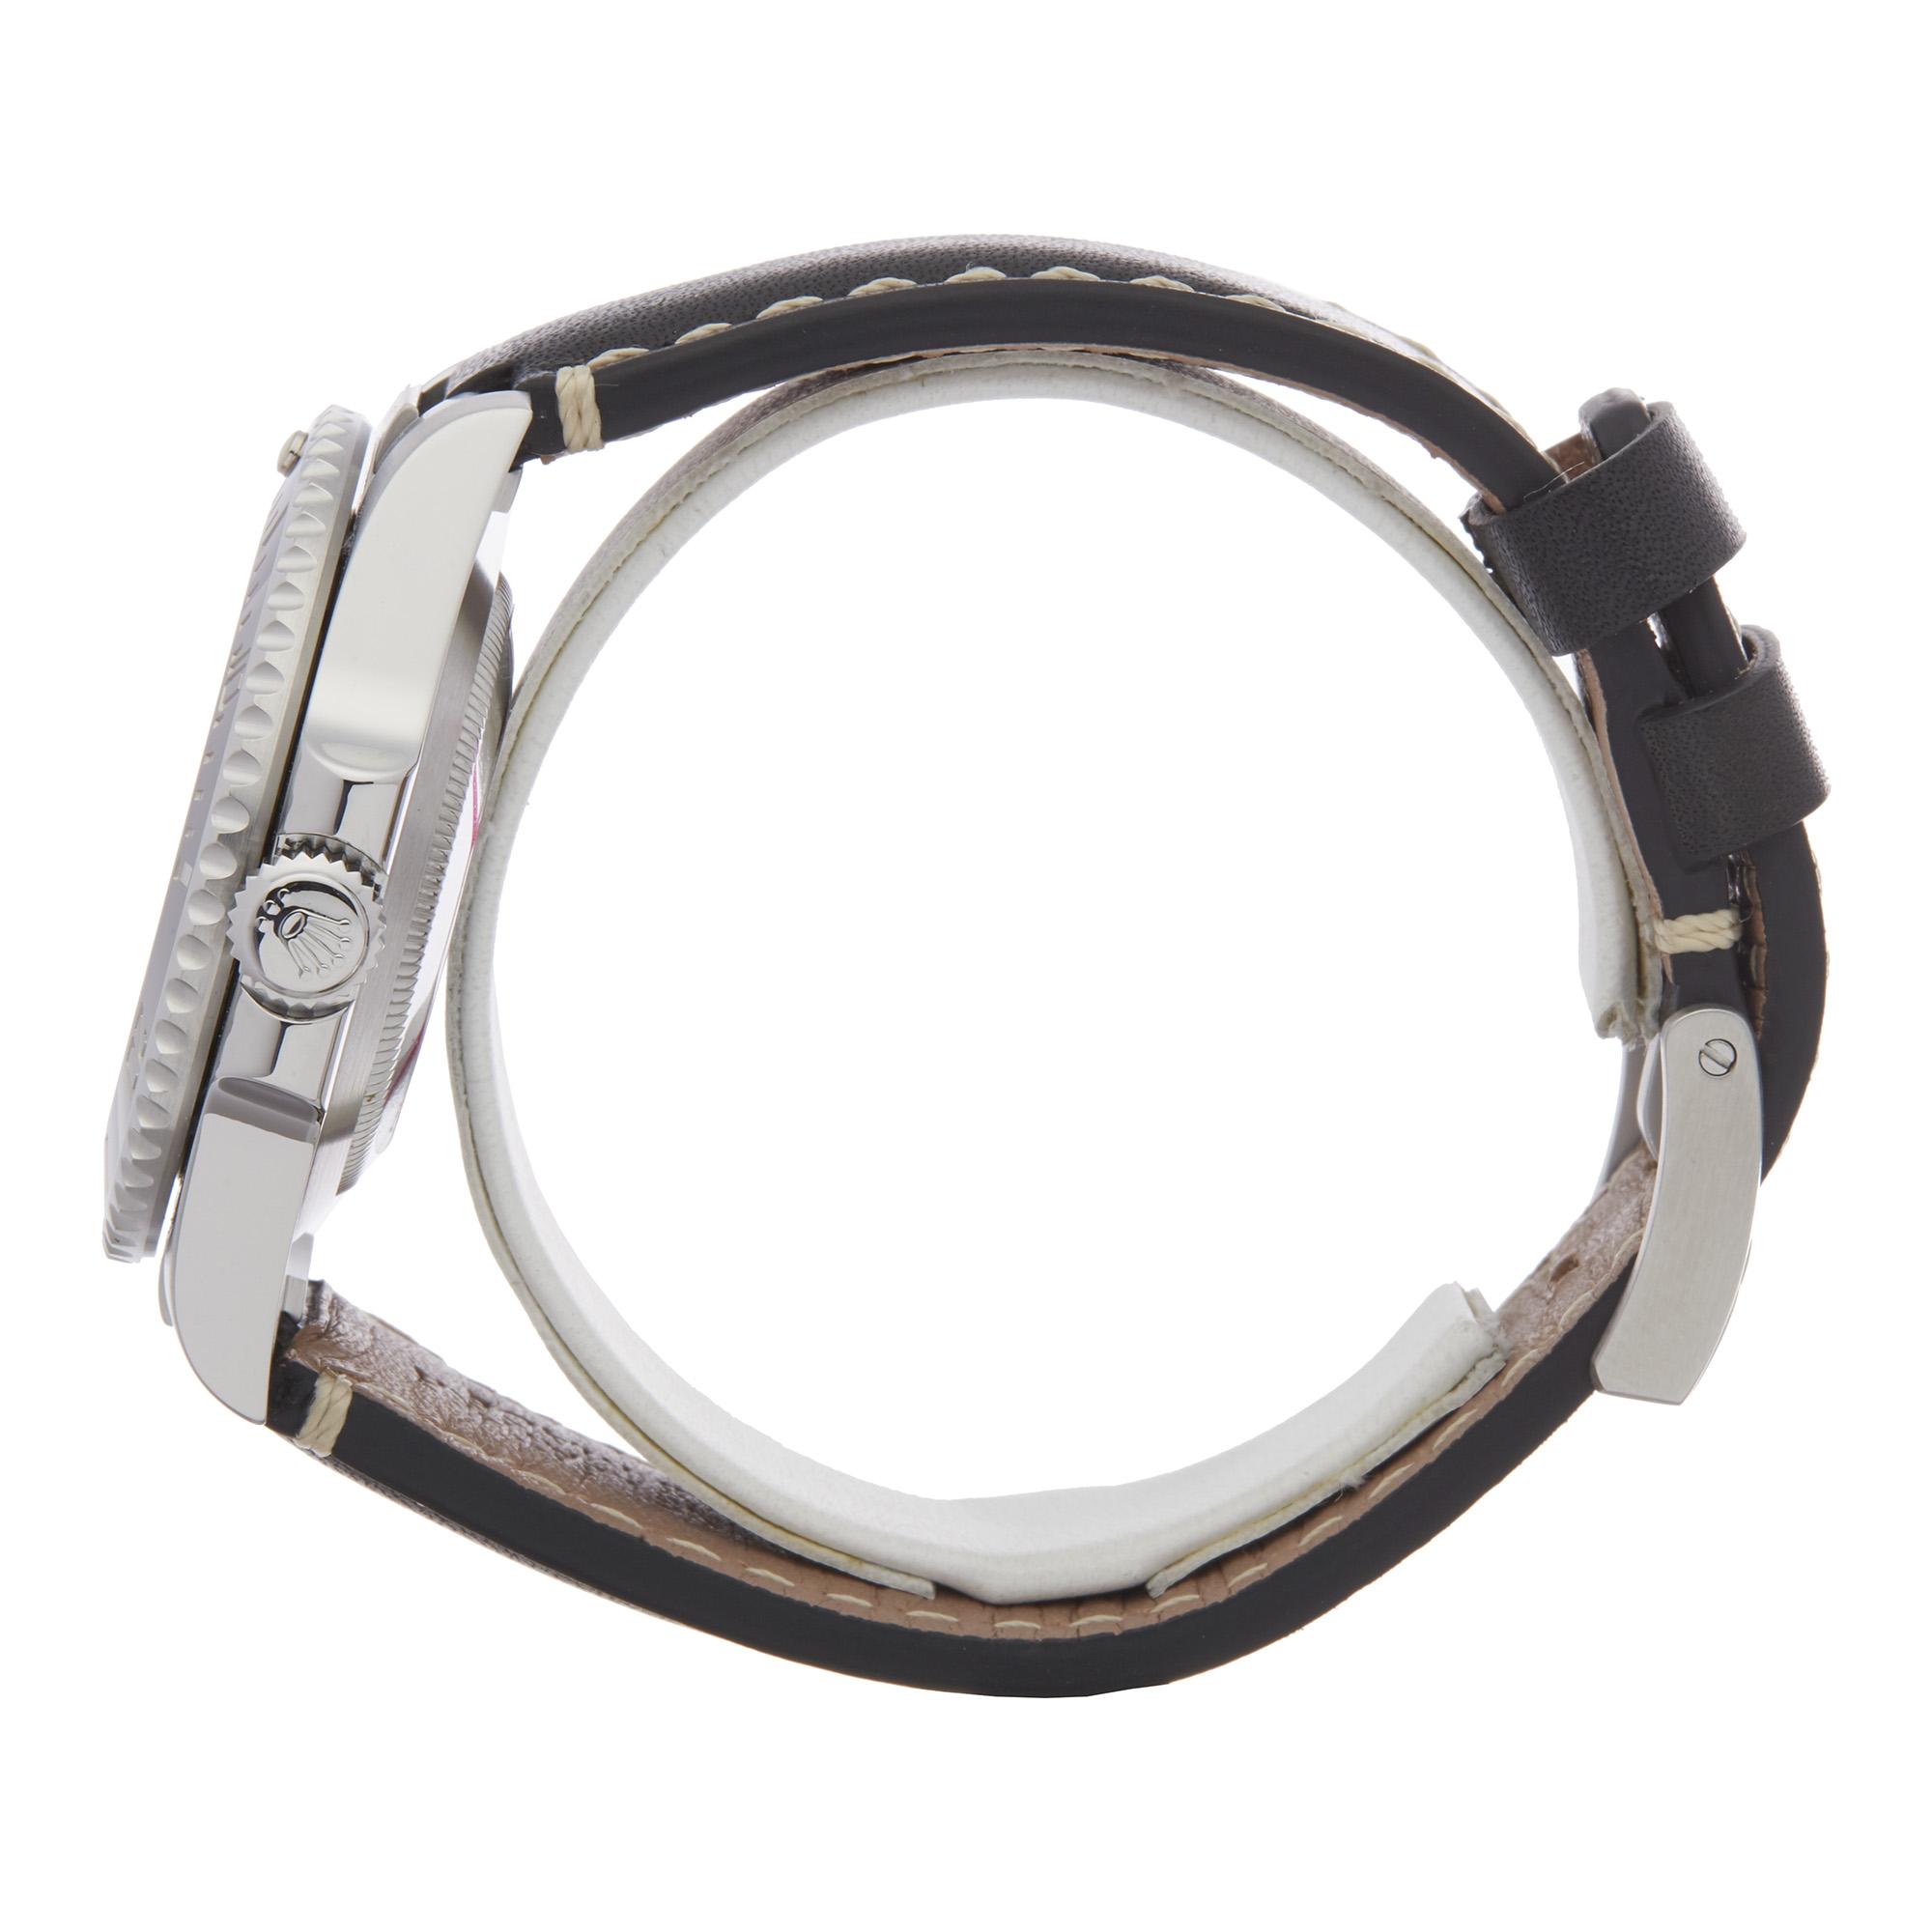 Rolex Submariner No Date 114060 Men Stainless Steel Watch - Image 7 of 8